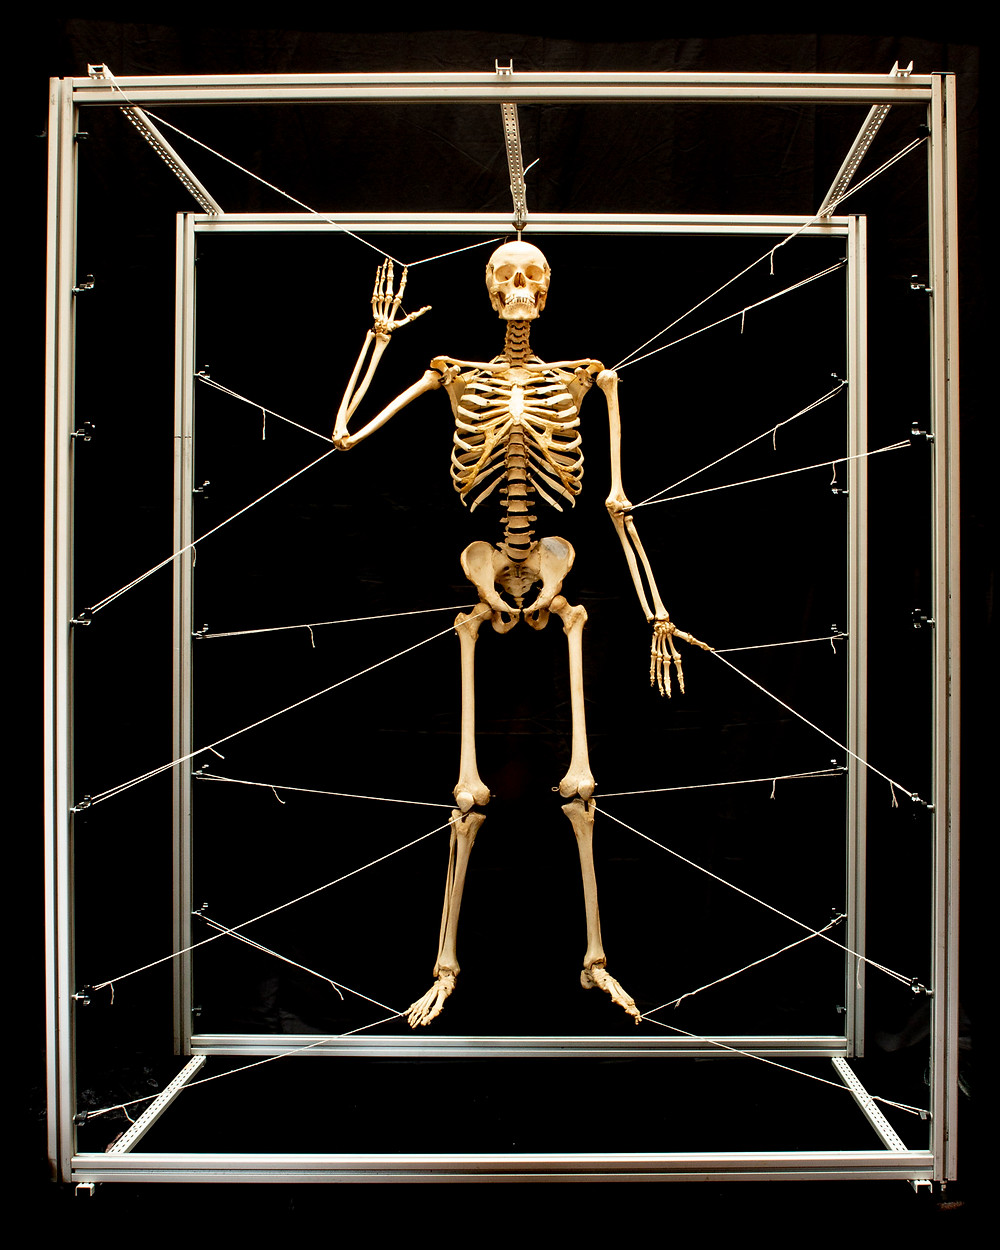 Skeleton cage photo as cover shot for Osteology2 portfolio